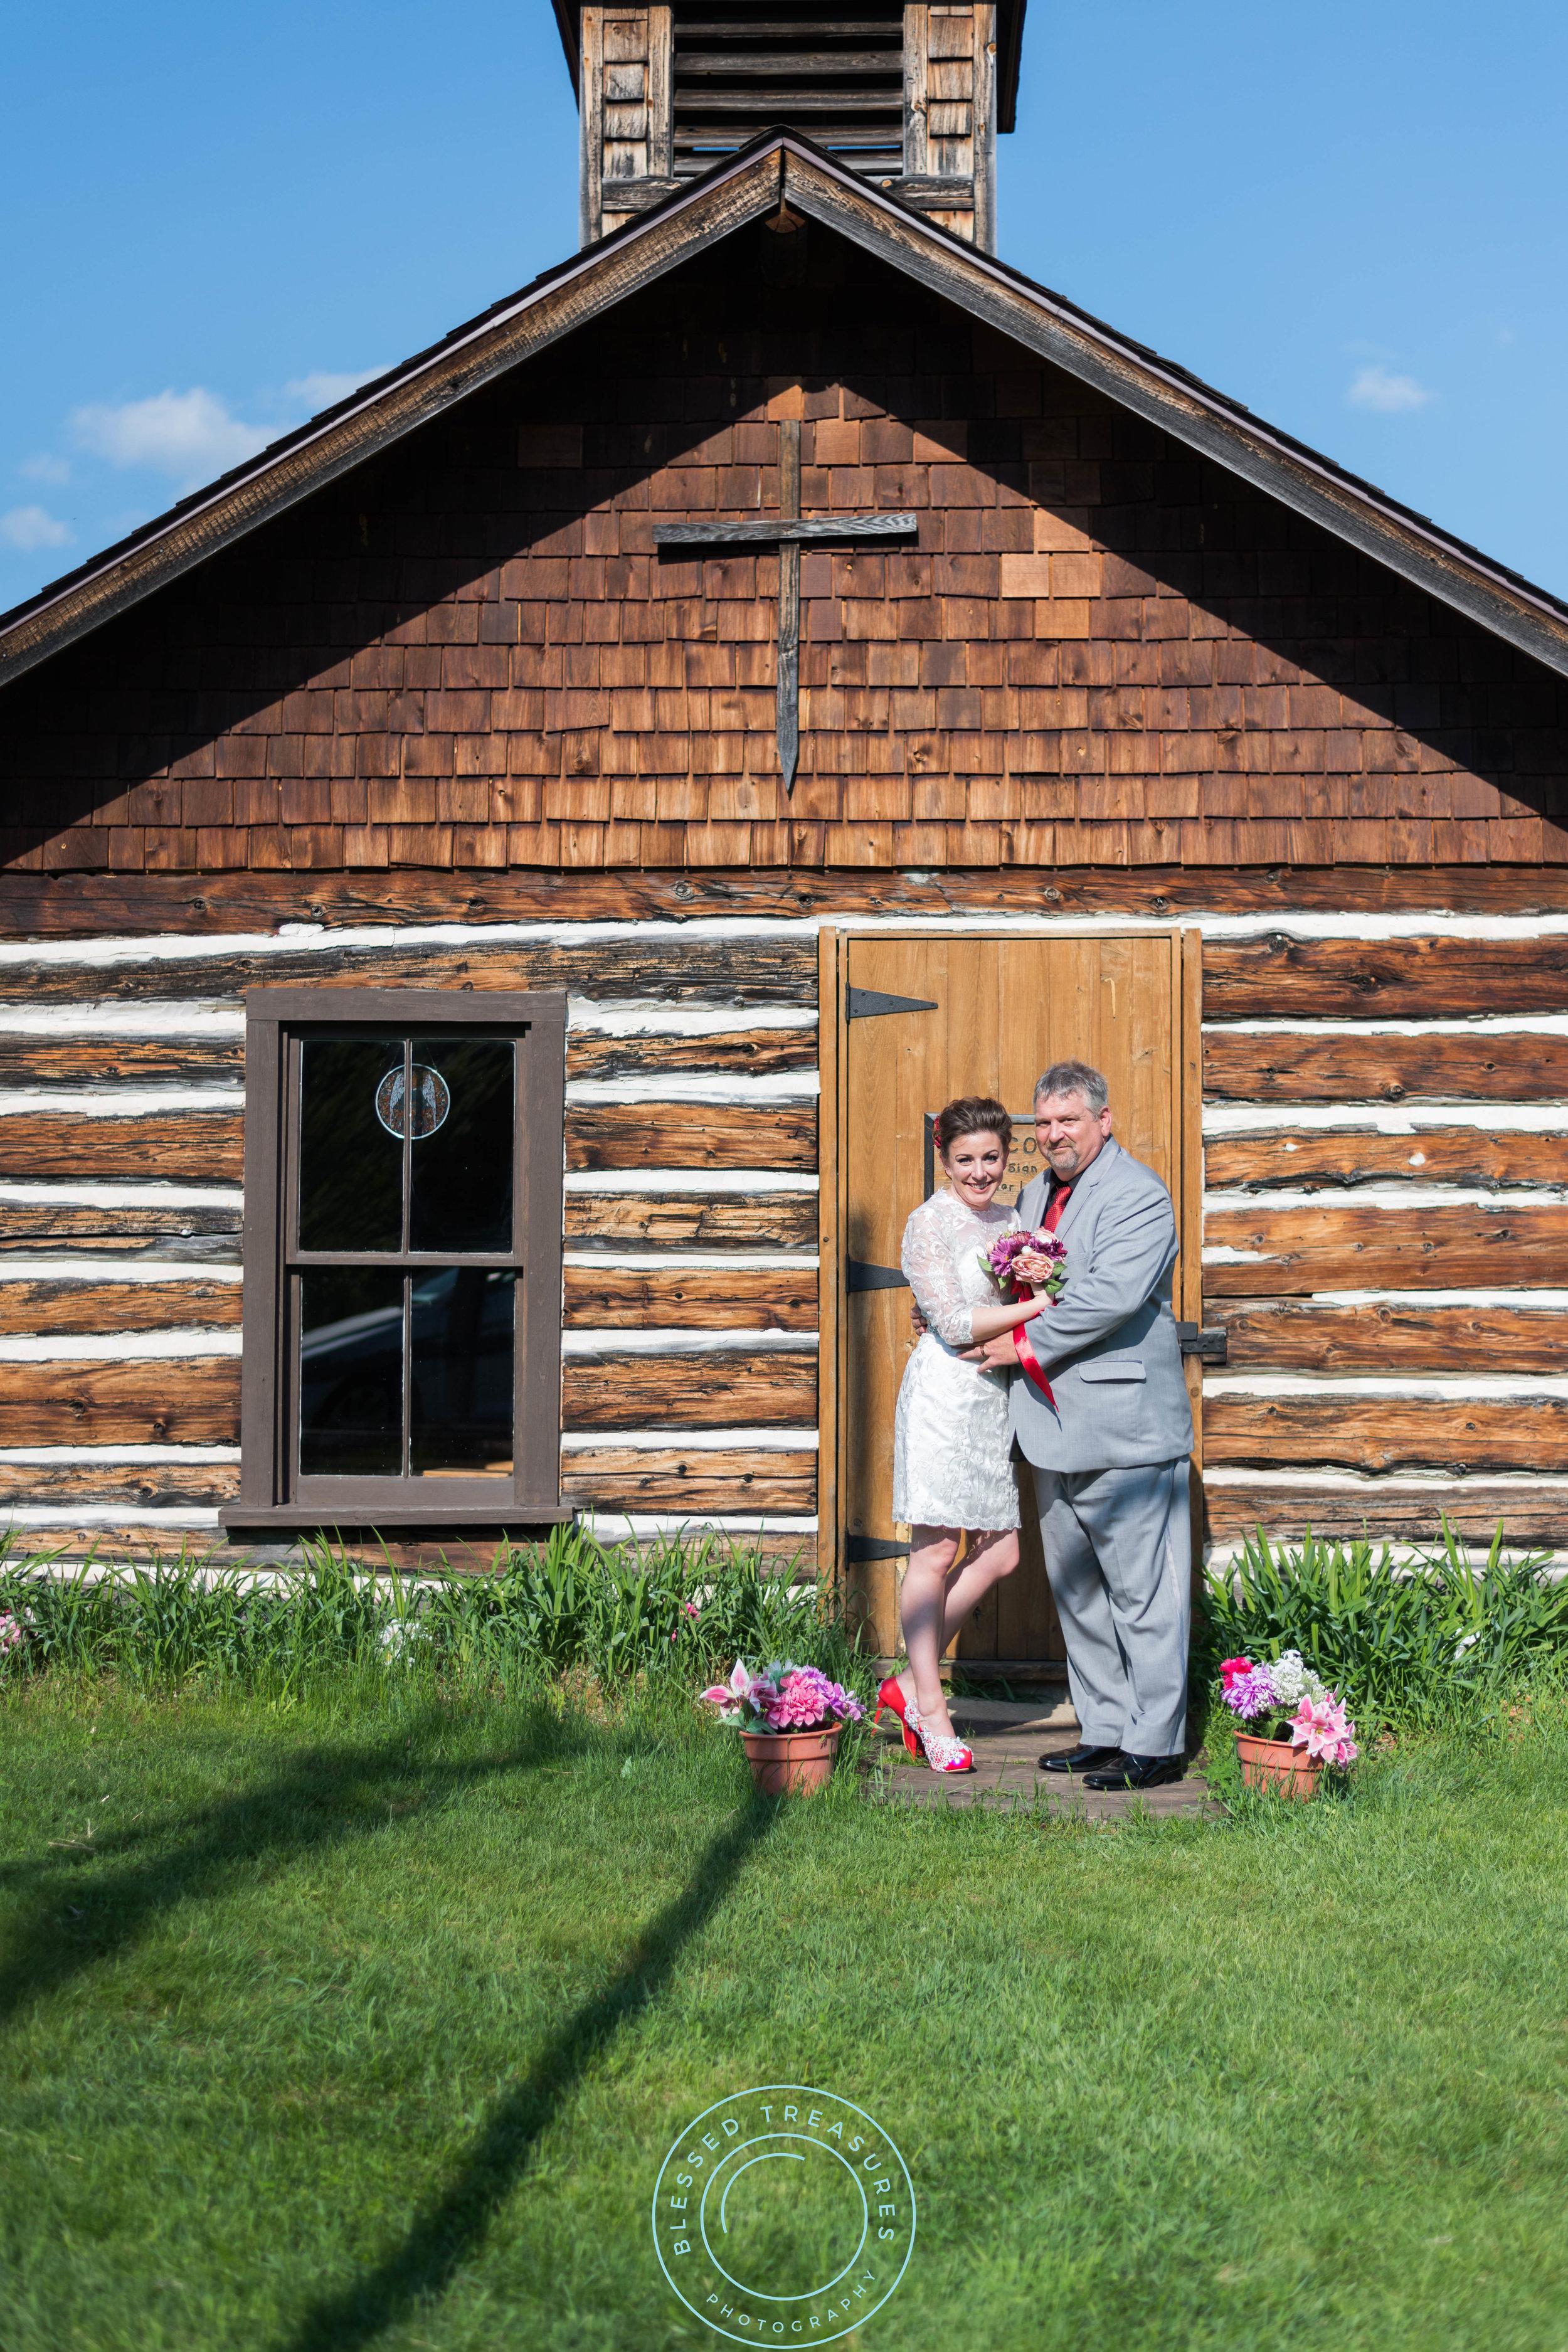 Mansfield township pioneer church crystal falls michigan wedding location white lace wedding dress red pumps